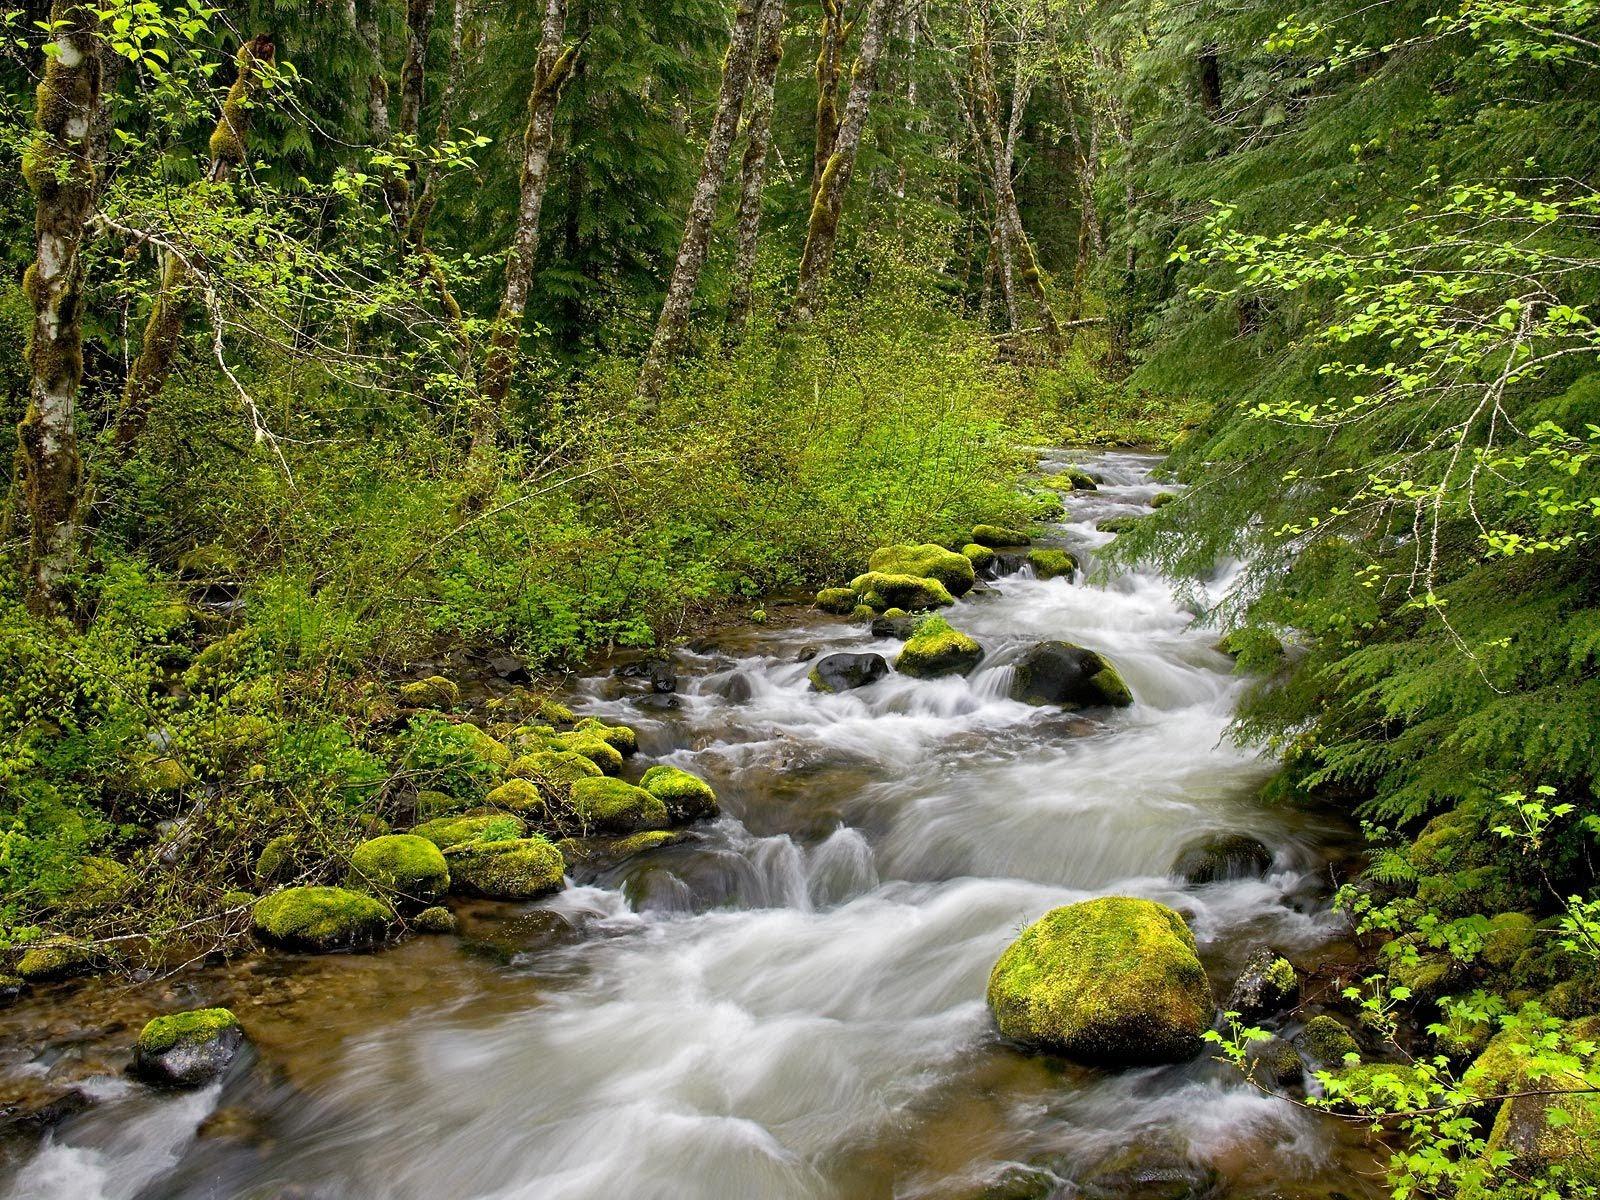 Hd Wallpaper Forest River